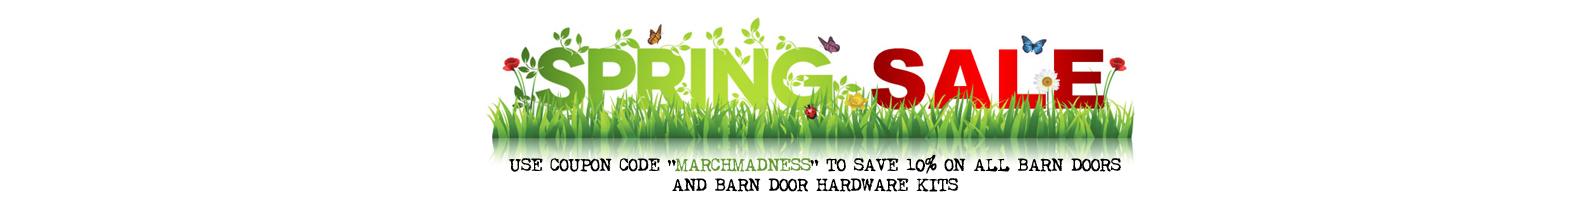 SPRING SALE - SAVE 10% ON BARN DOORS AND BARN DOOR HARDWARE KITS